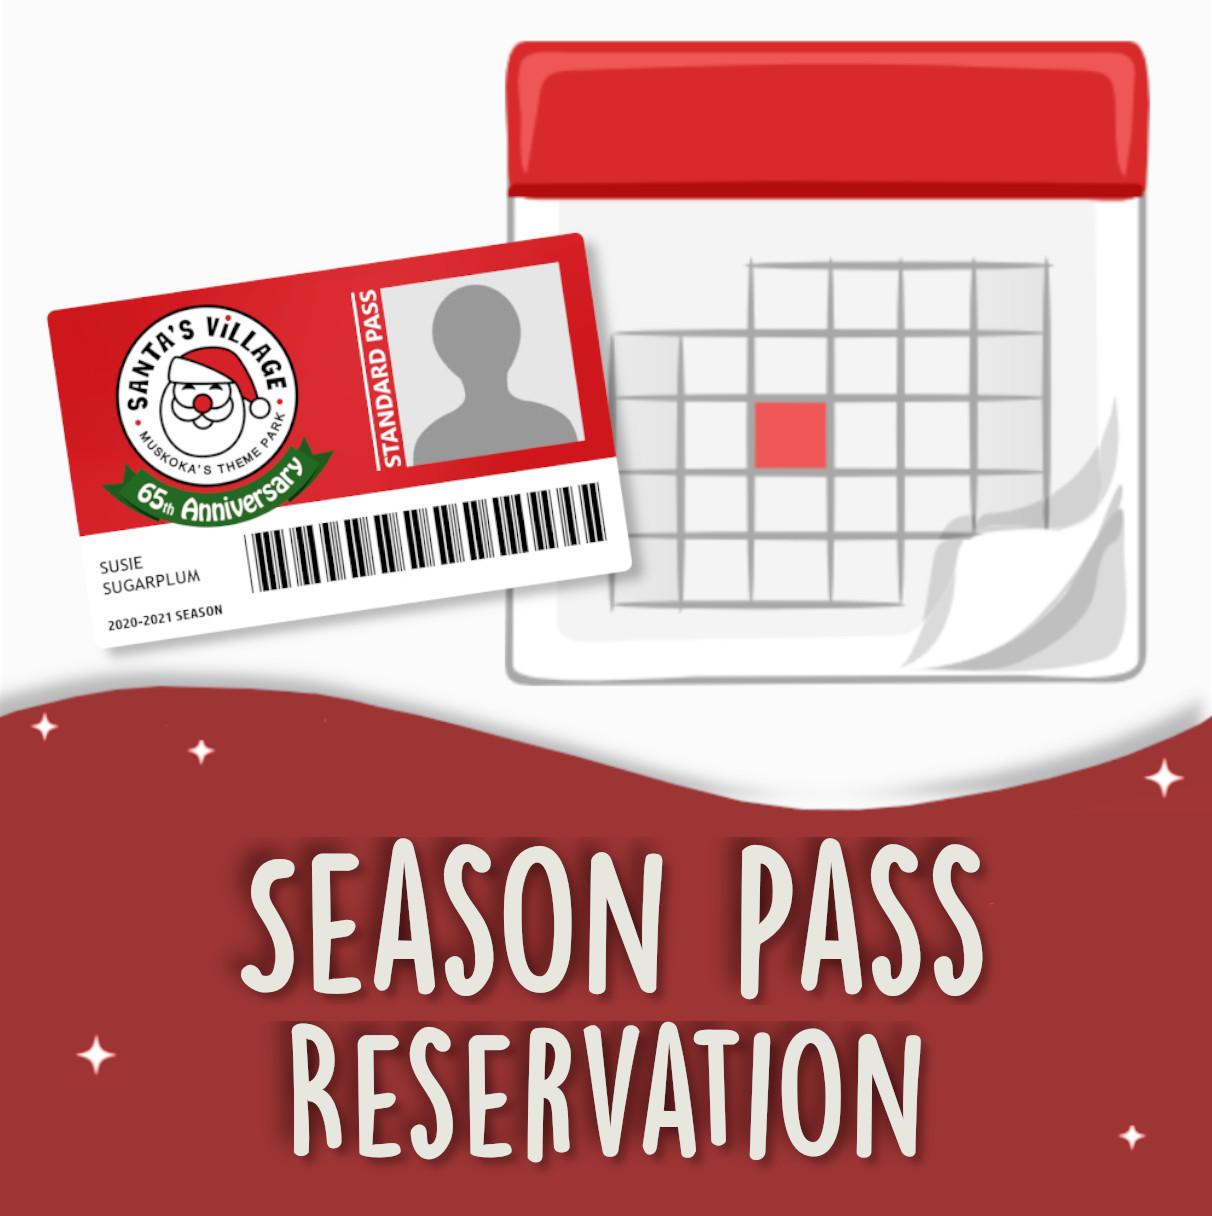 Season Pass Visit Reservation